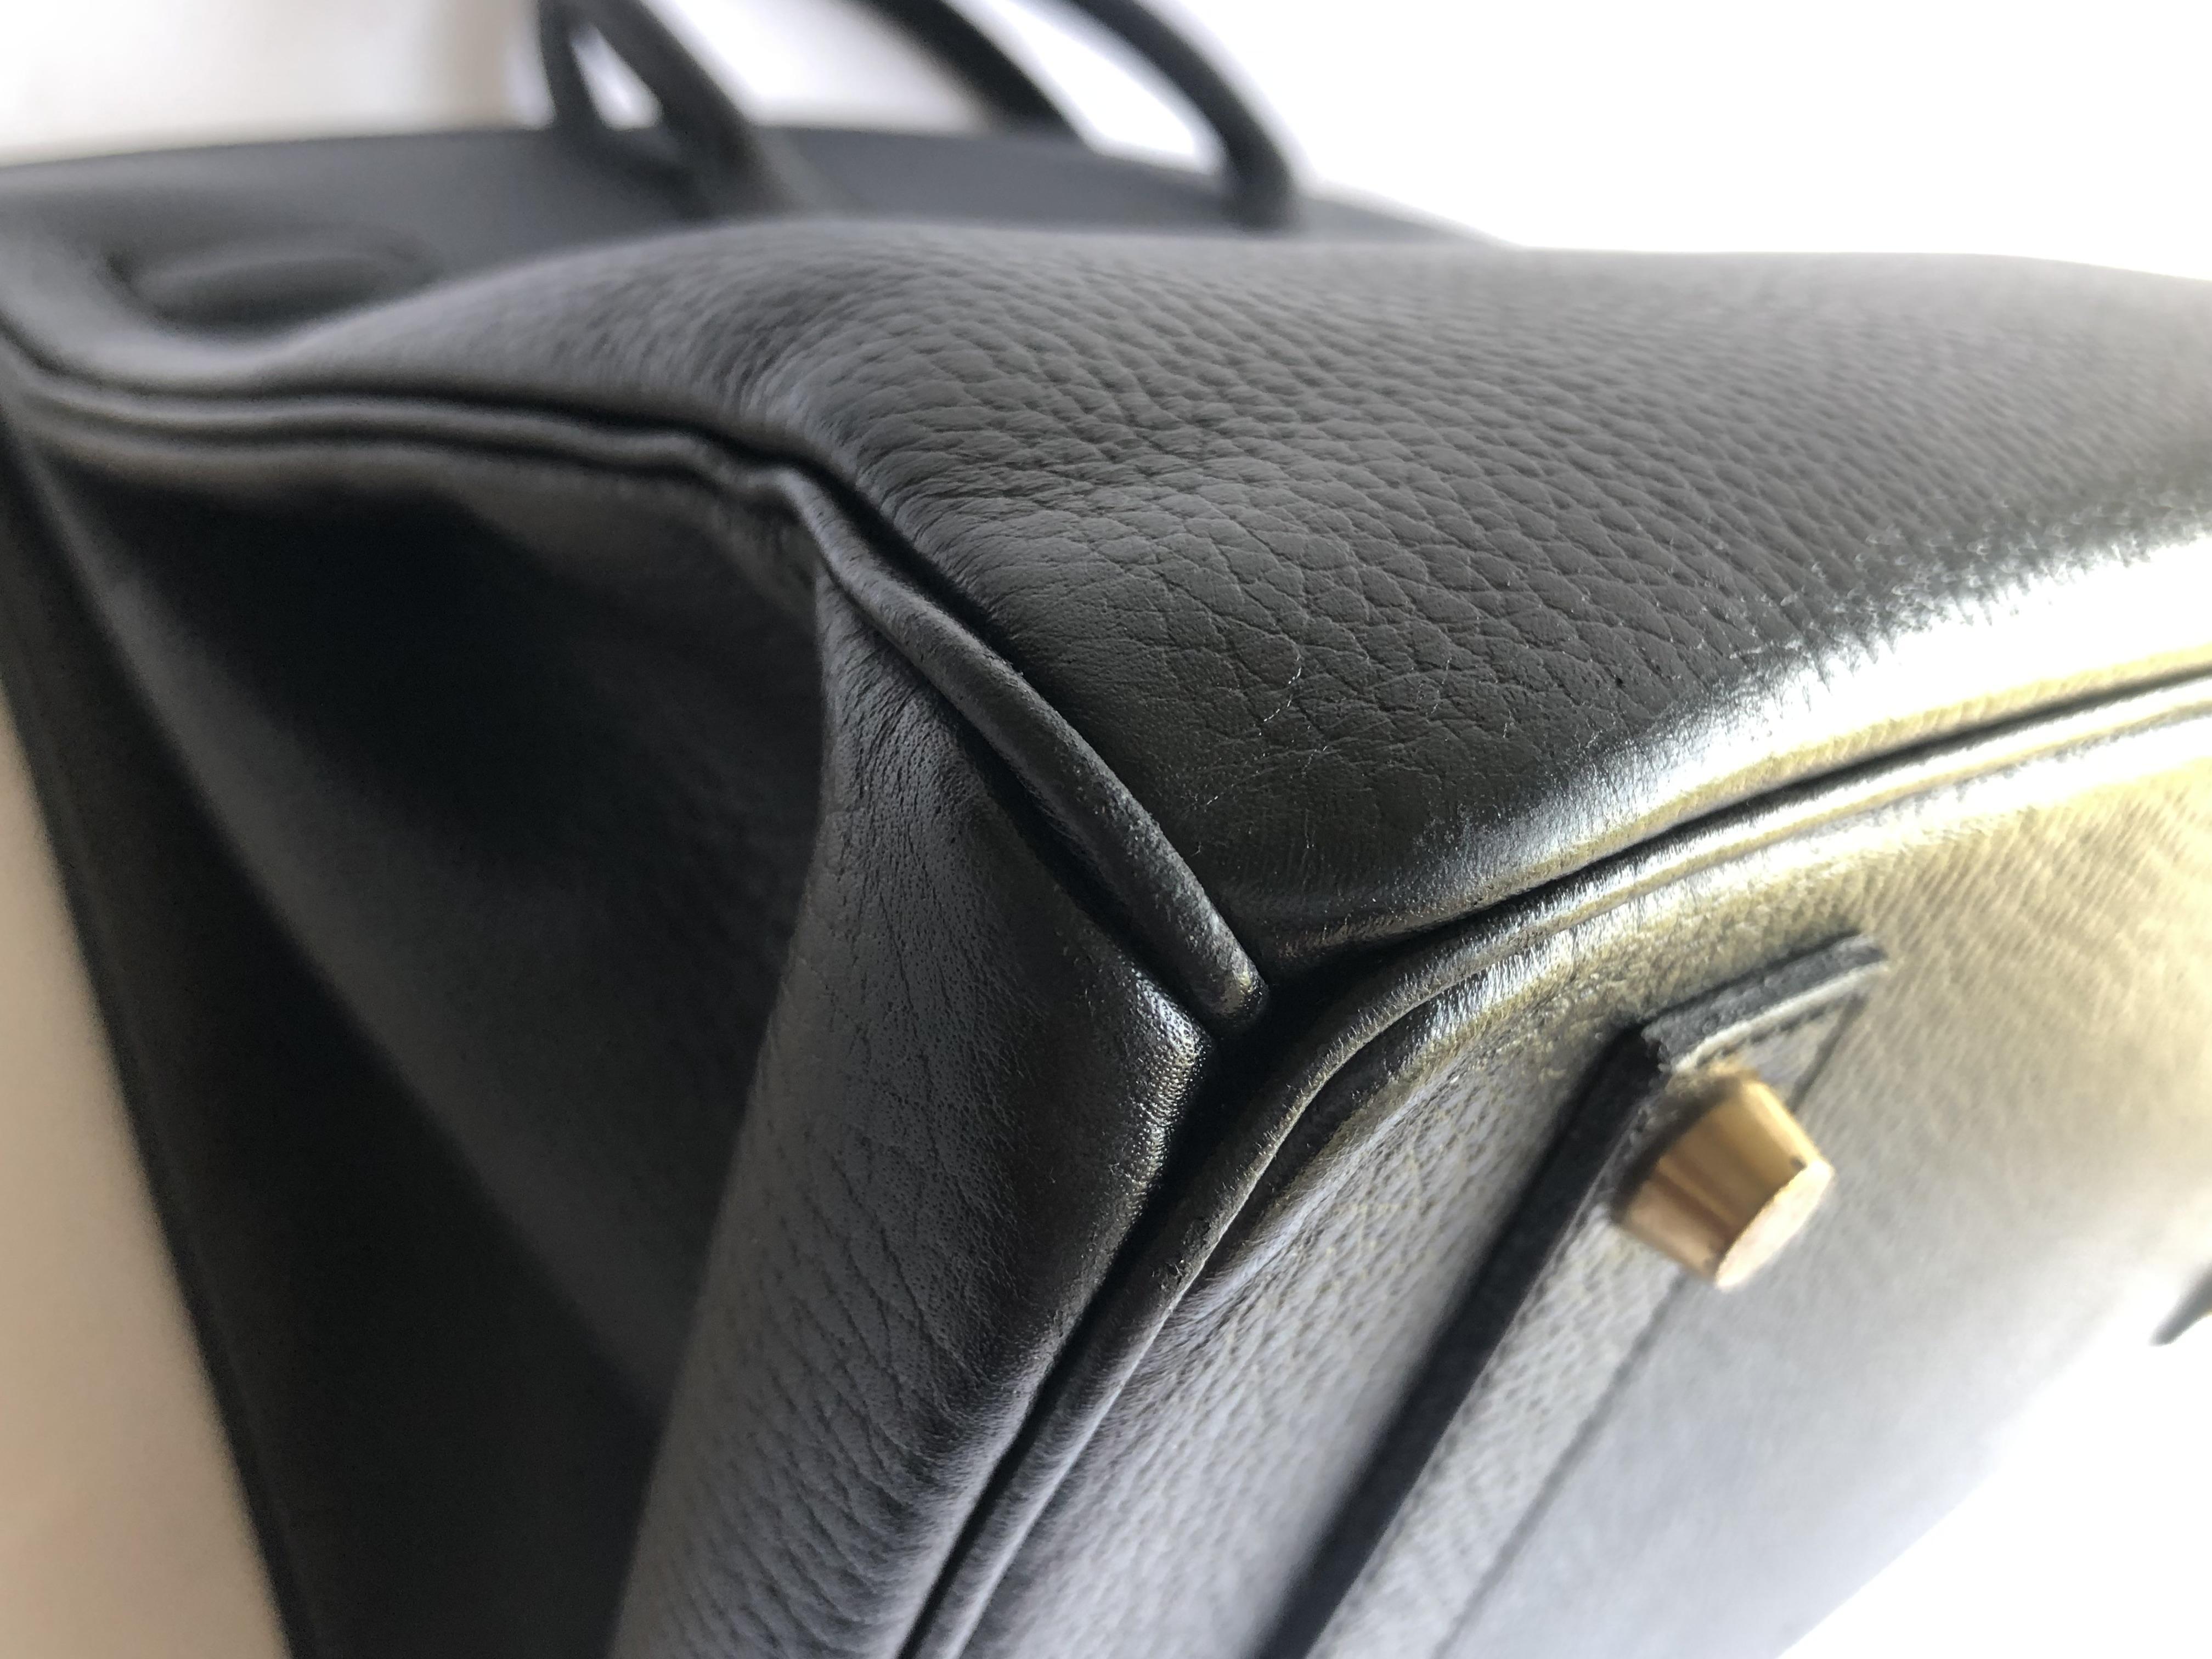 970b852eca Hermes Birkin 40 Cm Black Ardennes Gold Hardware Authentic Vintage ...